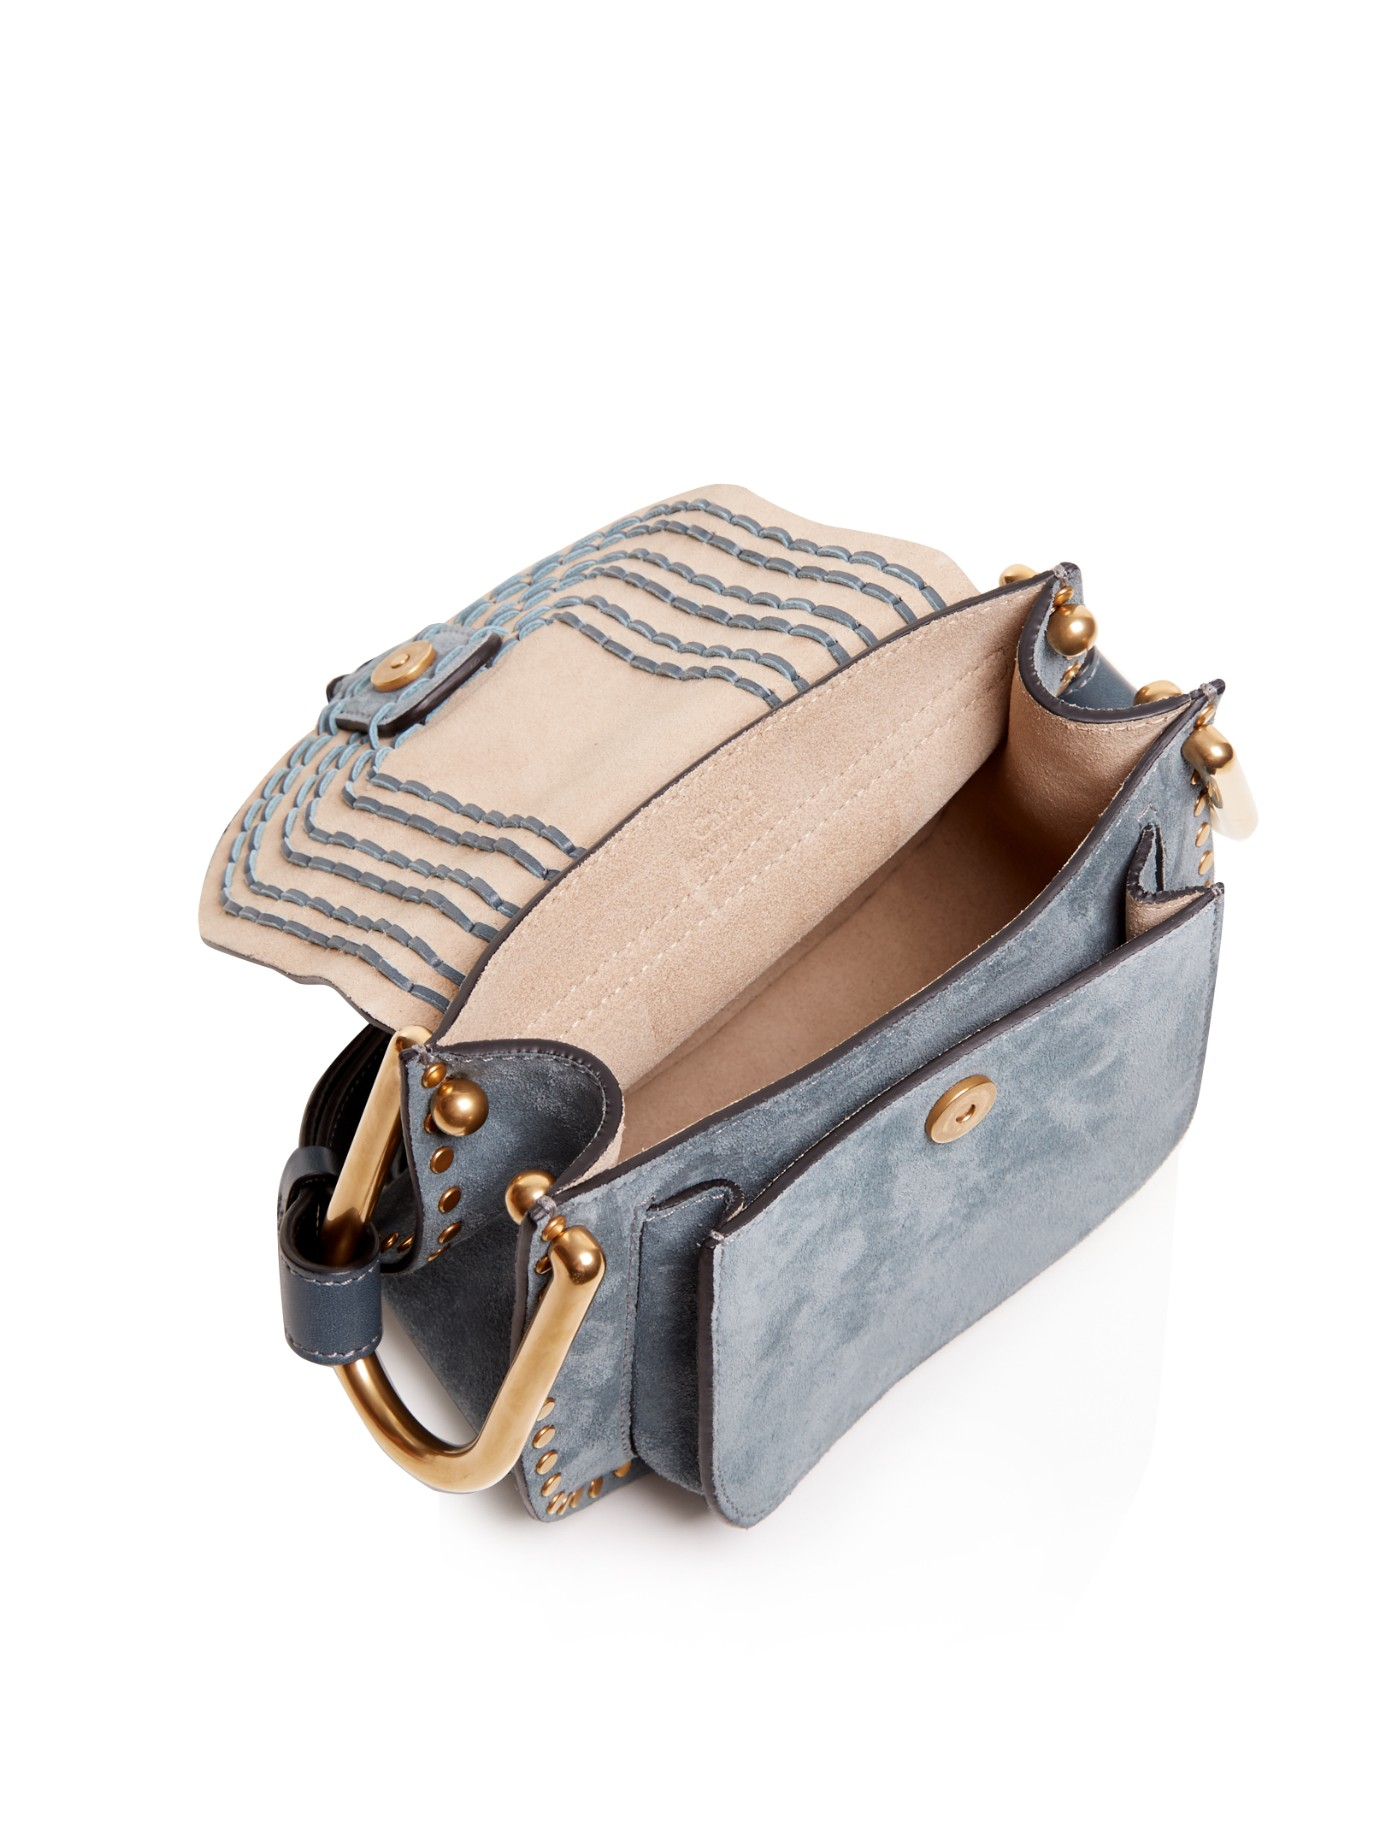 533c56289b01 Chloé Hudson Suede Cross-Body Bag in Blue - Lyst